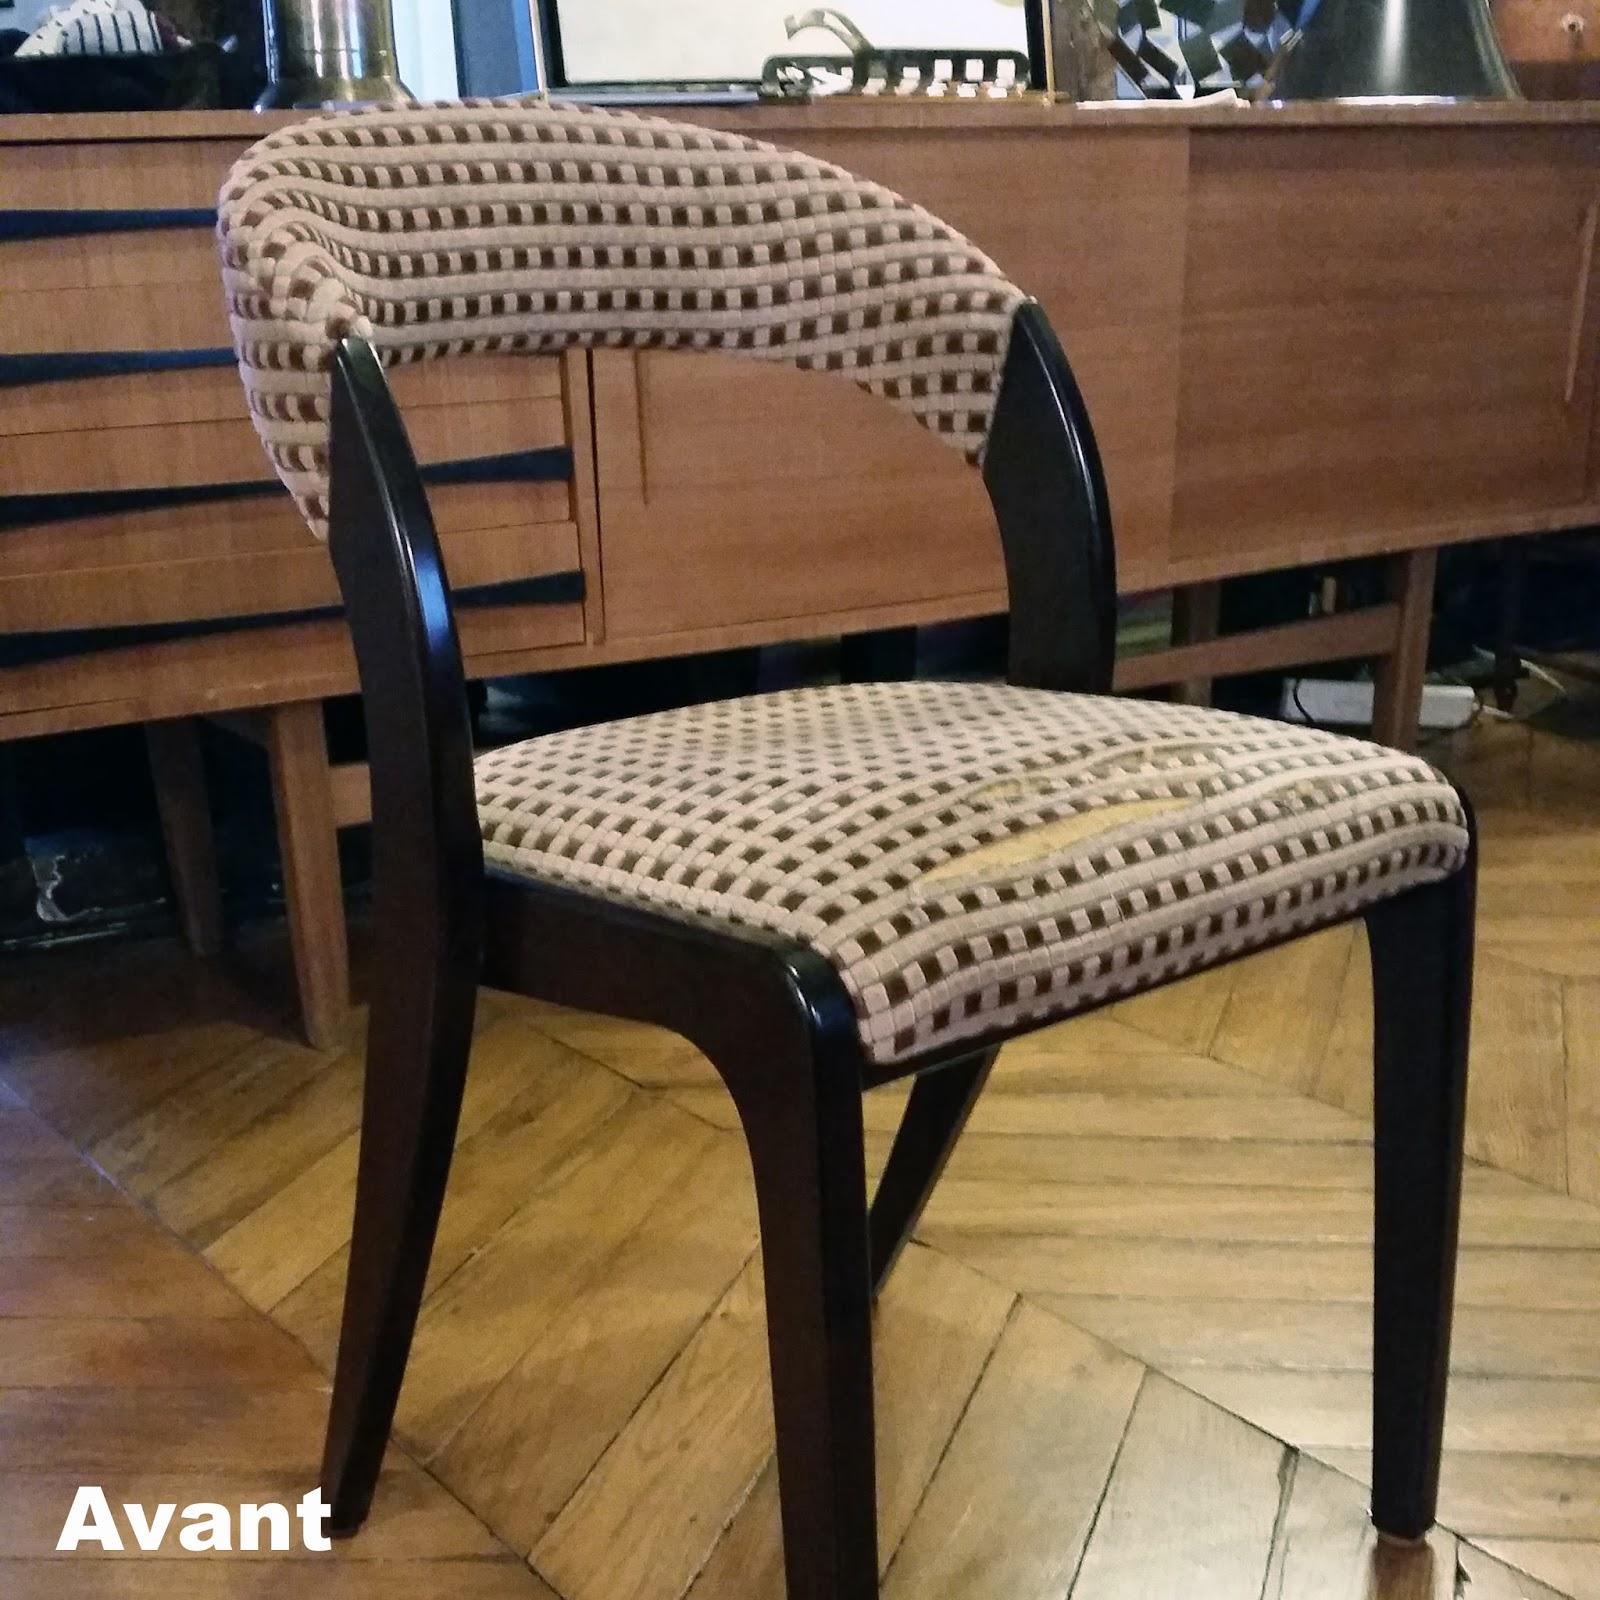 avant apr s chaise vintage atelier velvet artisan tapissier paris 10e. Black Bedroom Furniture Sets. Home Design Ideas